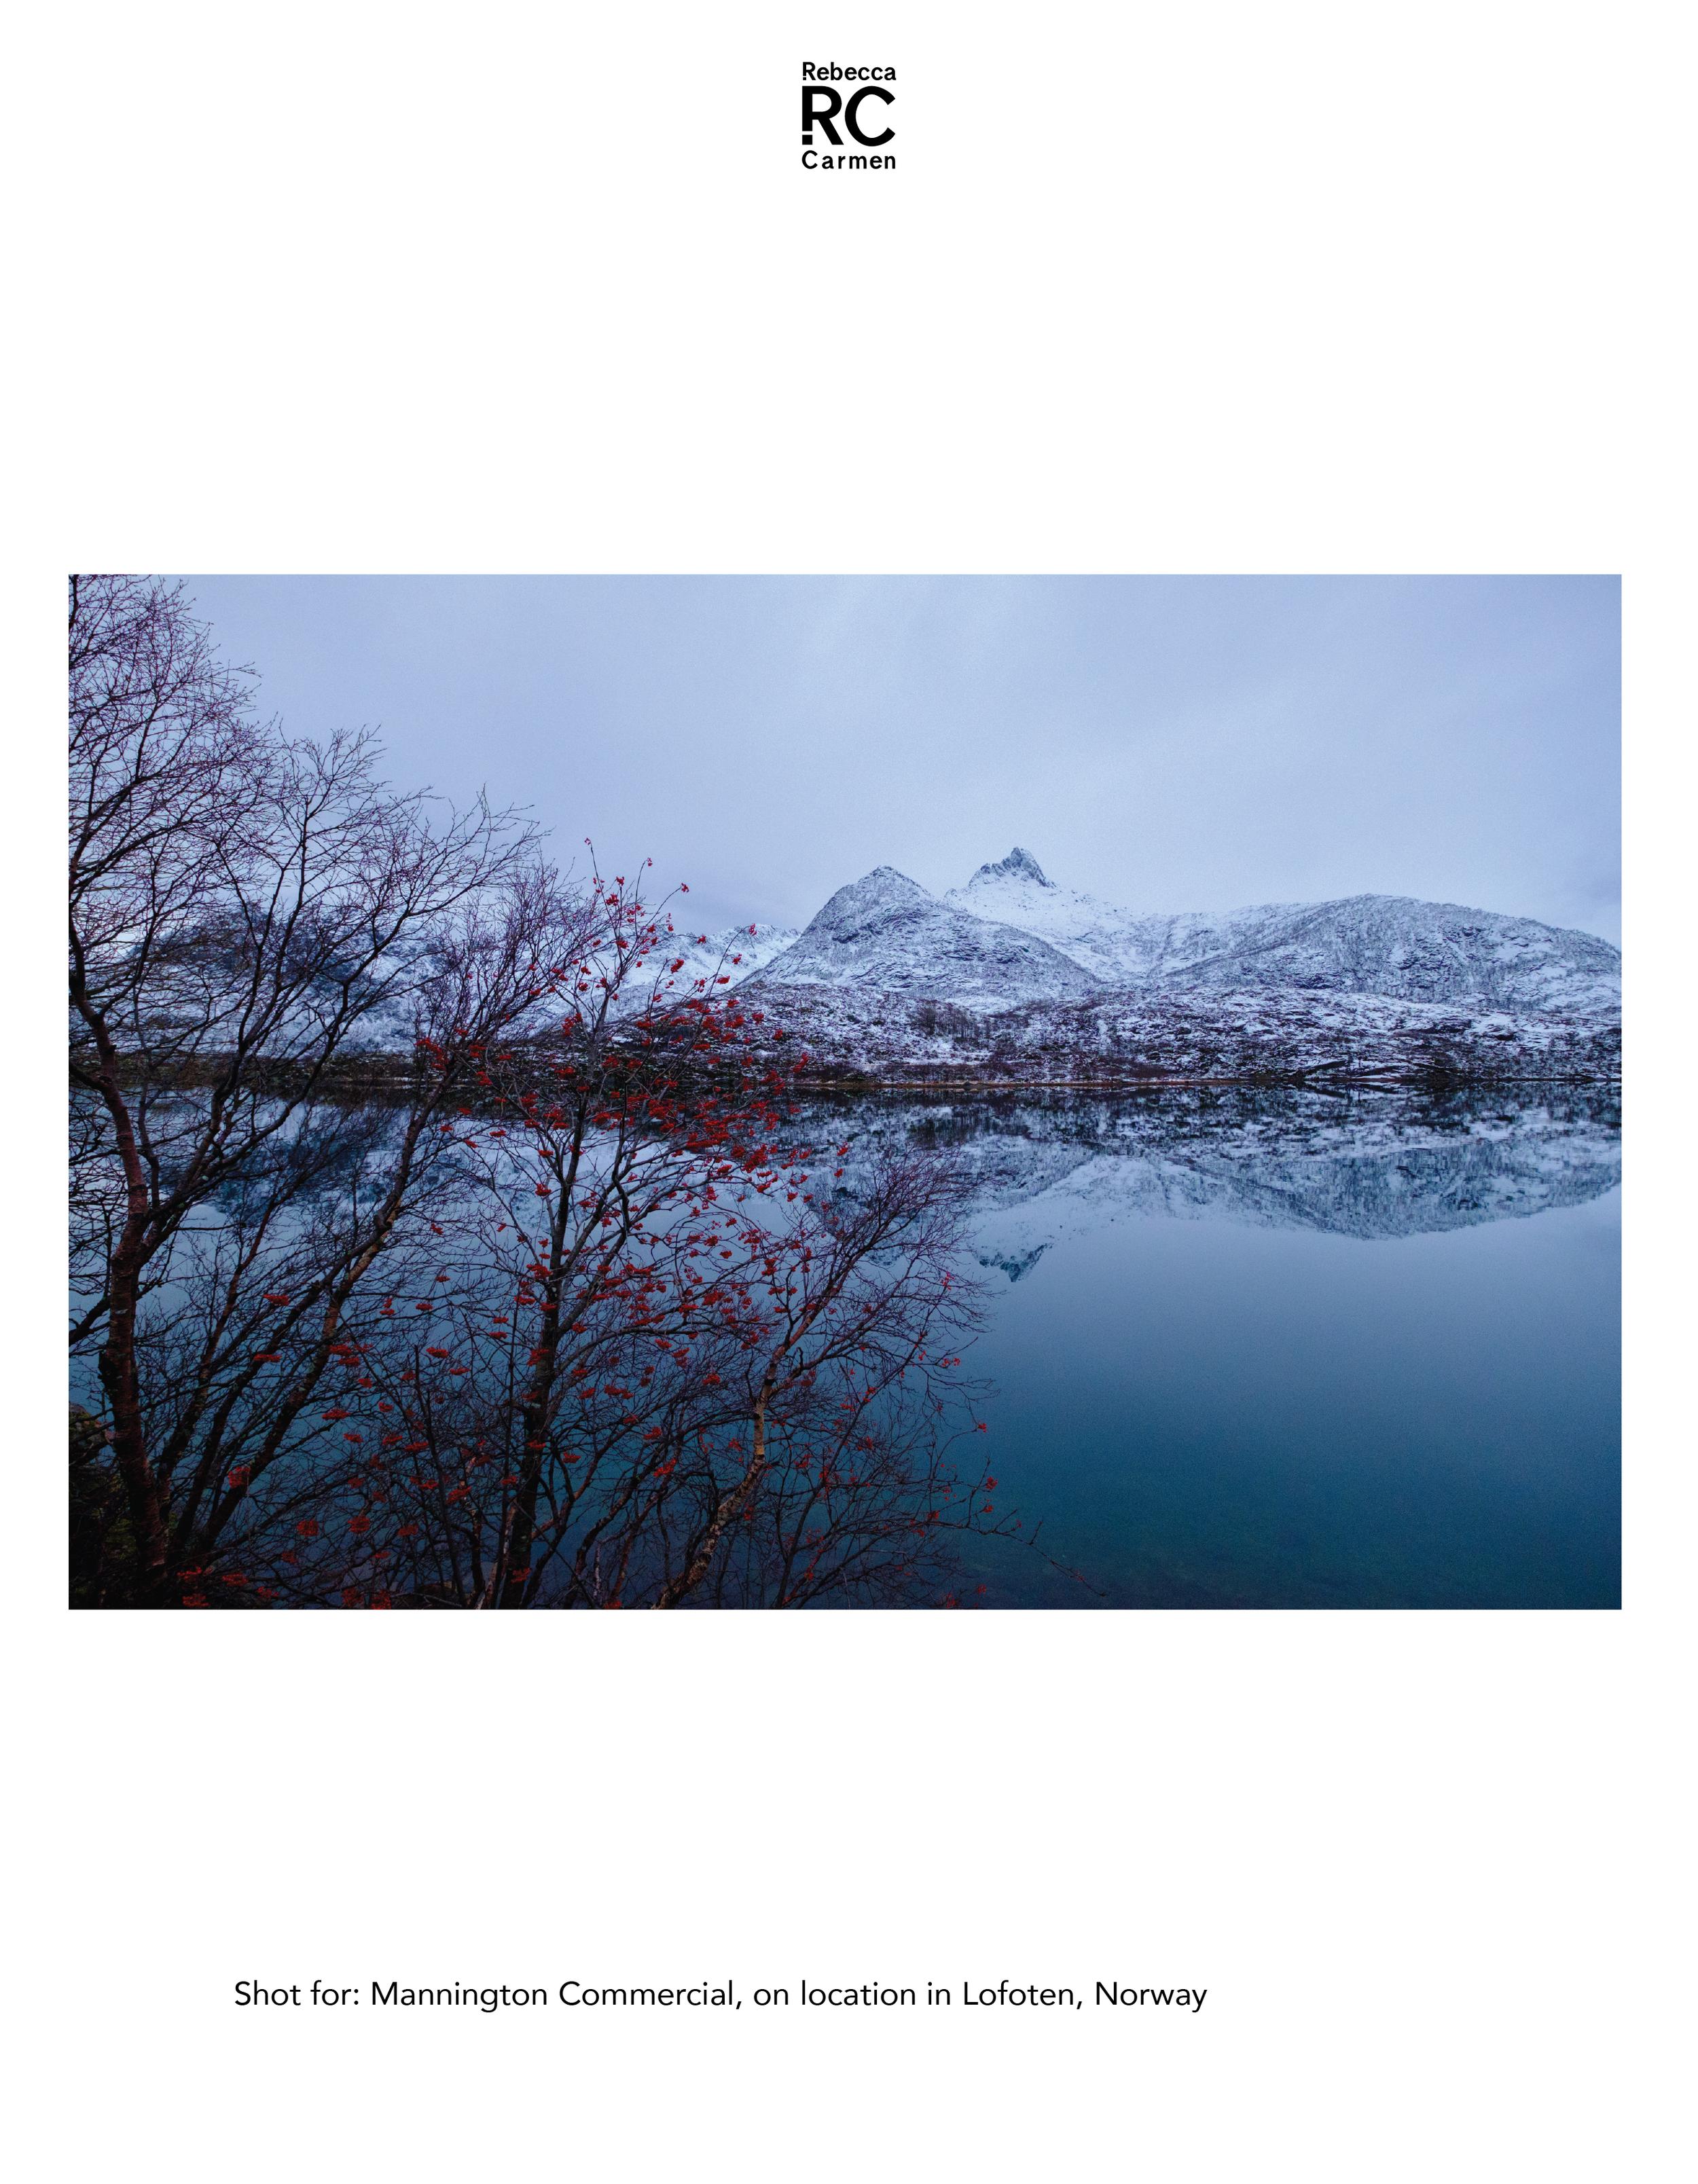 RebeccaSwindall-PHOTOPortfolio18-12.png